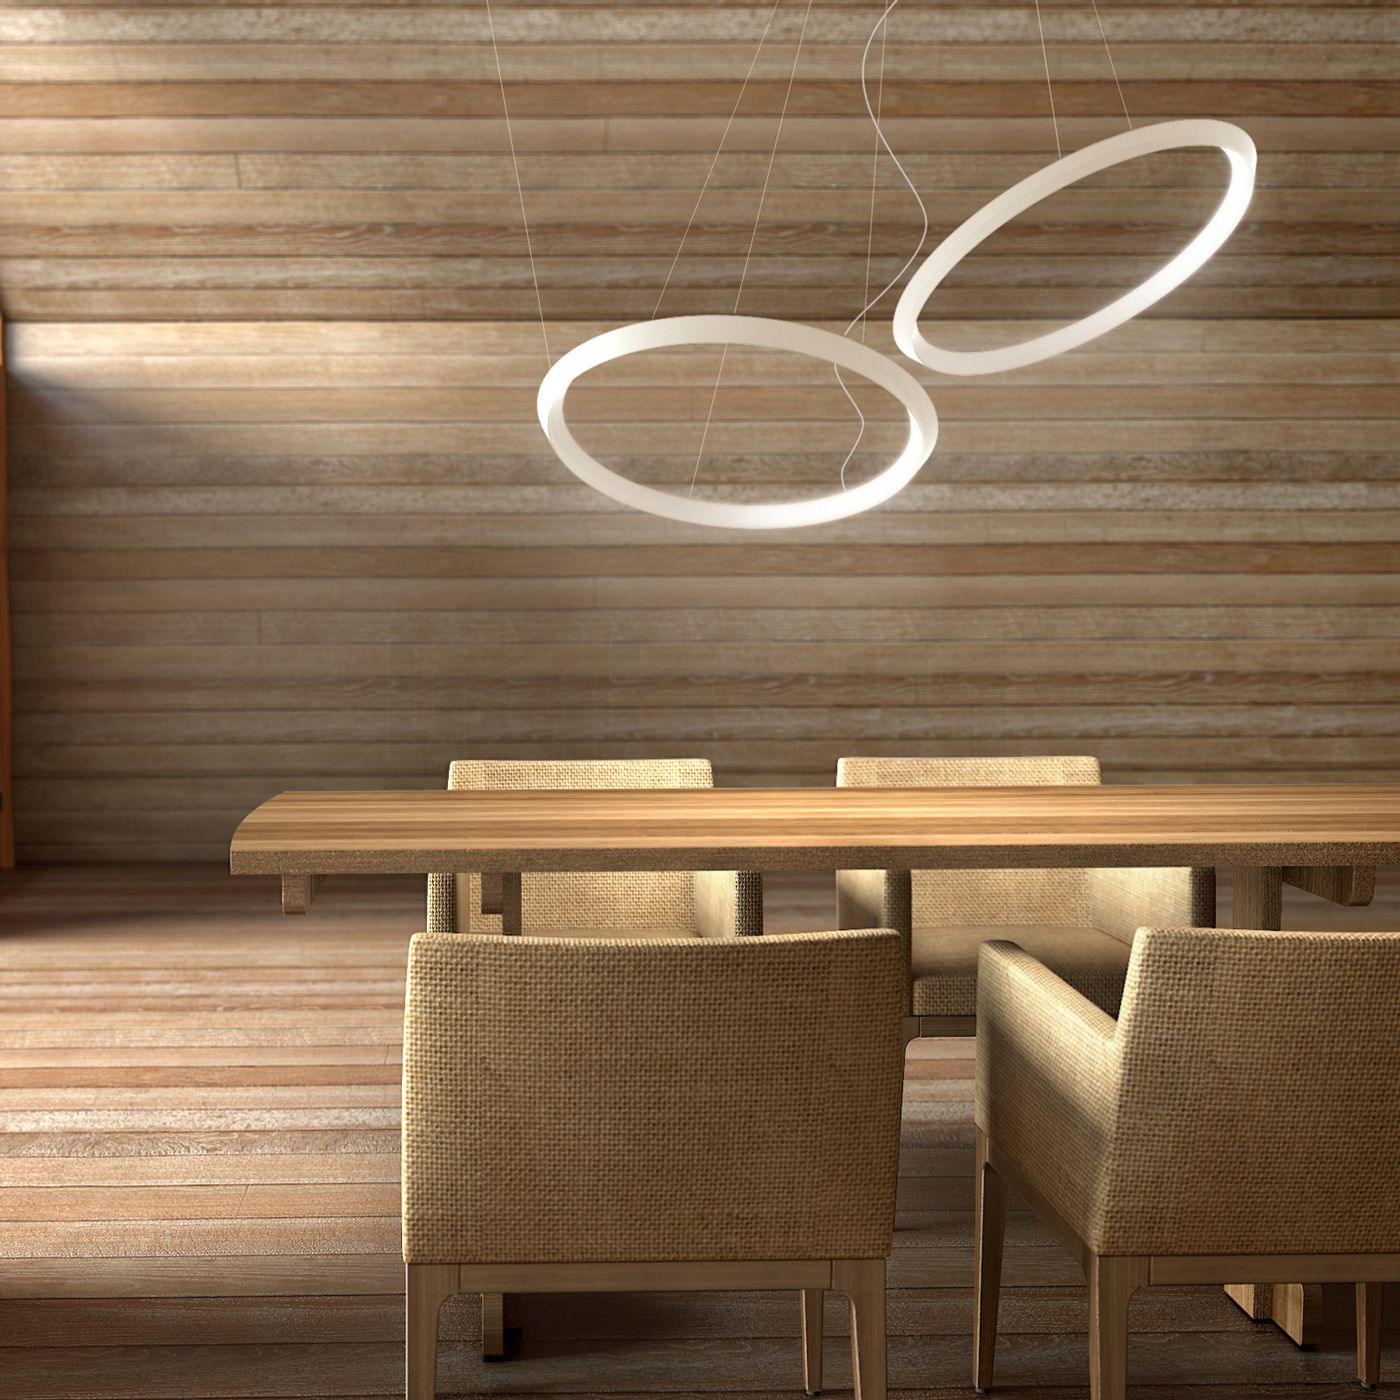 Vibia halo circular pendant light led pendant lights aloadofball Image collections